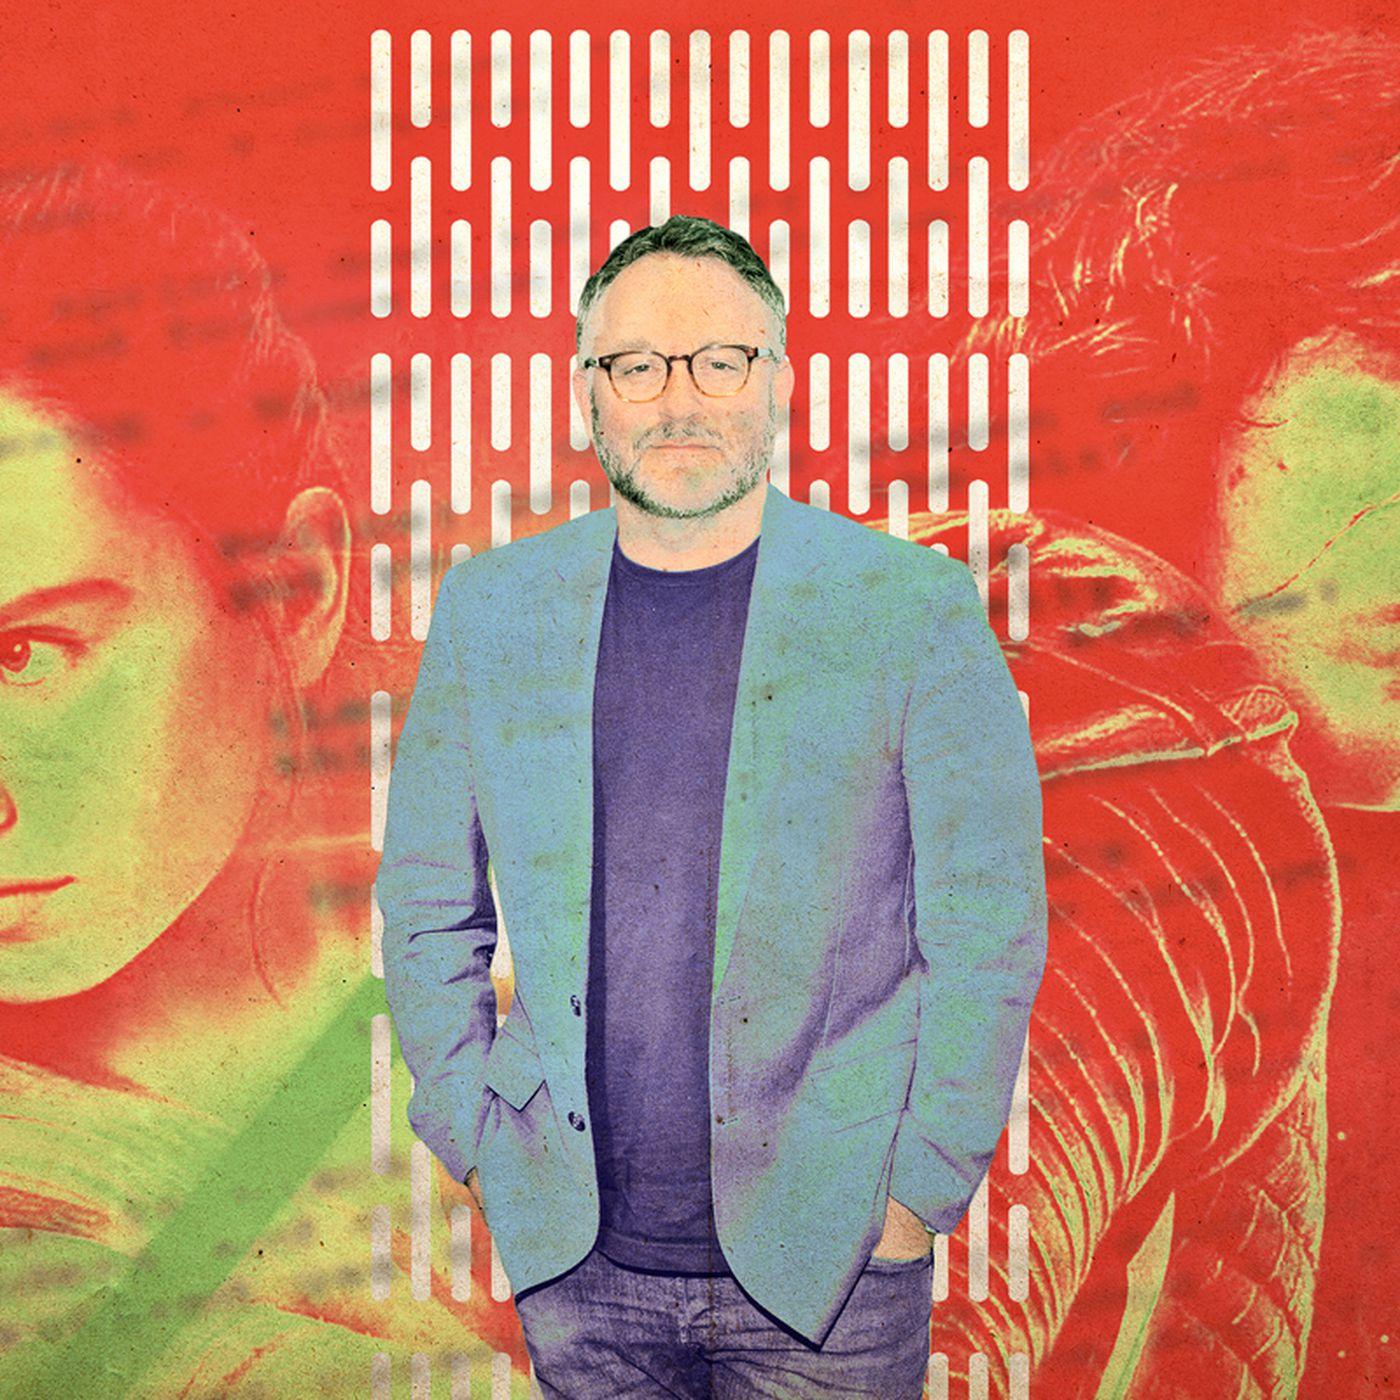 Is The Trevorrow Star Wars Script Better Than Rise Of Skywalker The Ringer